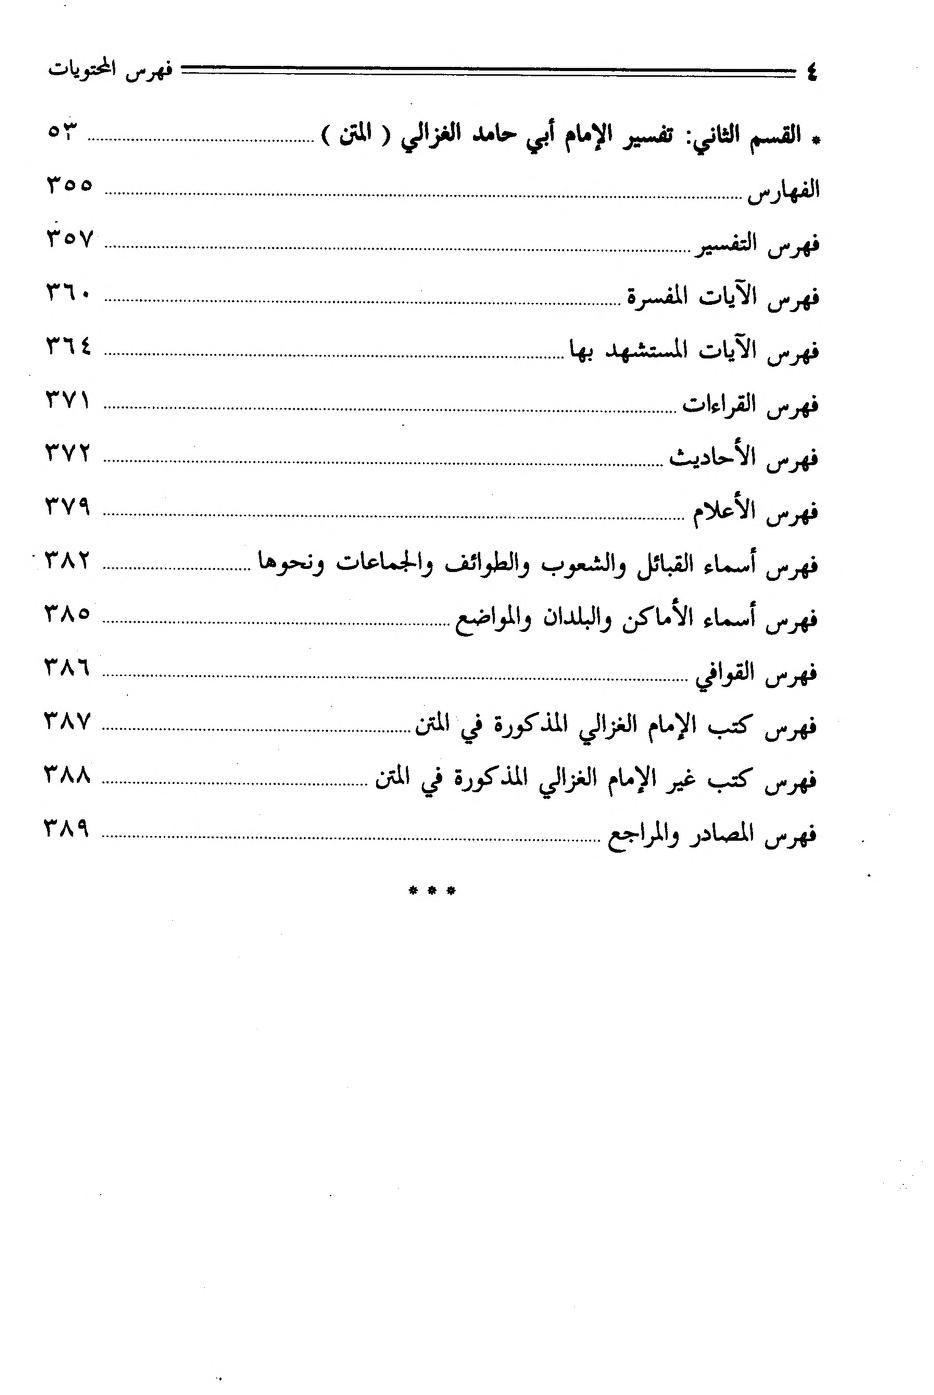 تفسير الإمام الغزالي أفقر عباد الله Free Download Borrow And Streaming Internet Archive Paperback Books Internet Archive Top Websites